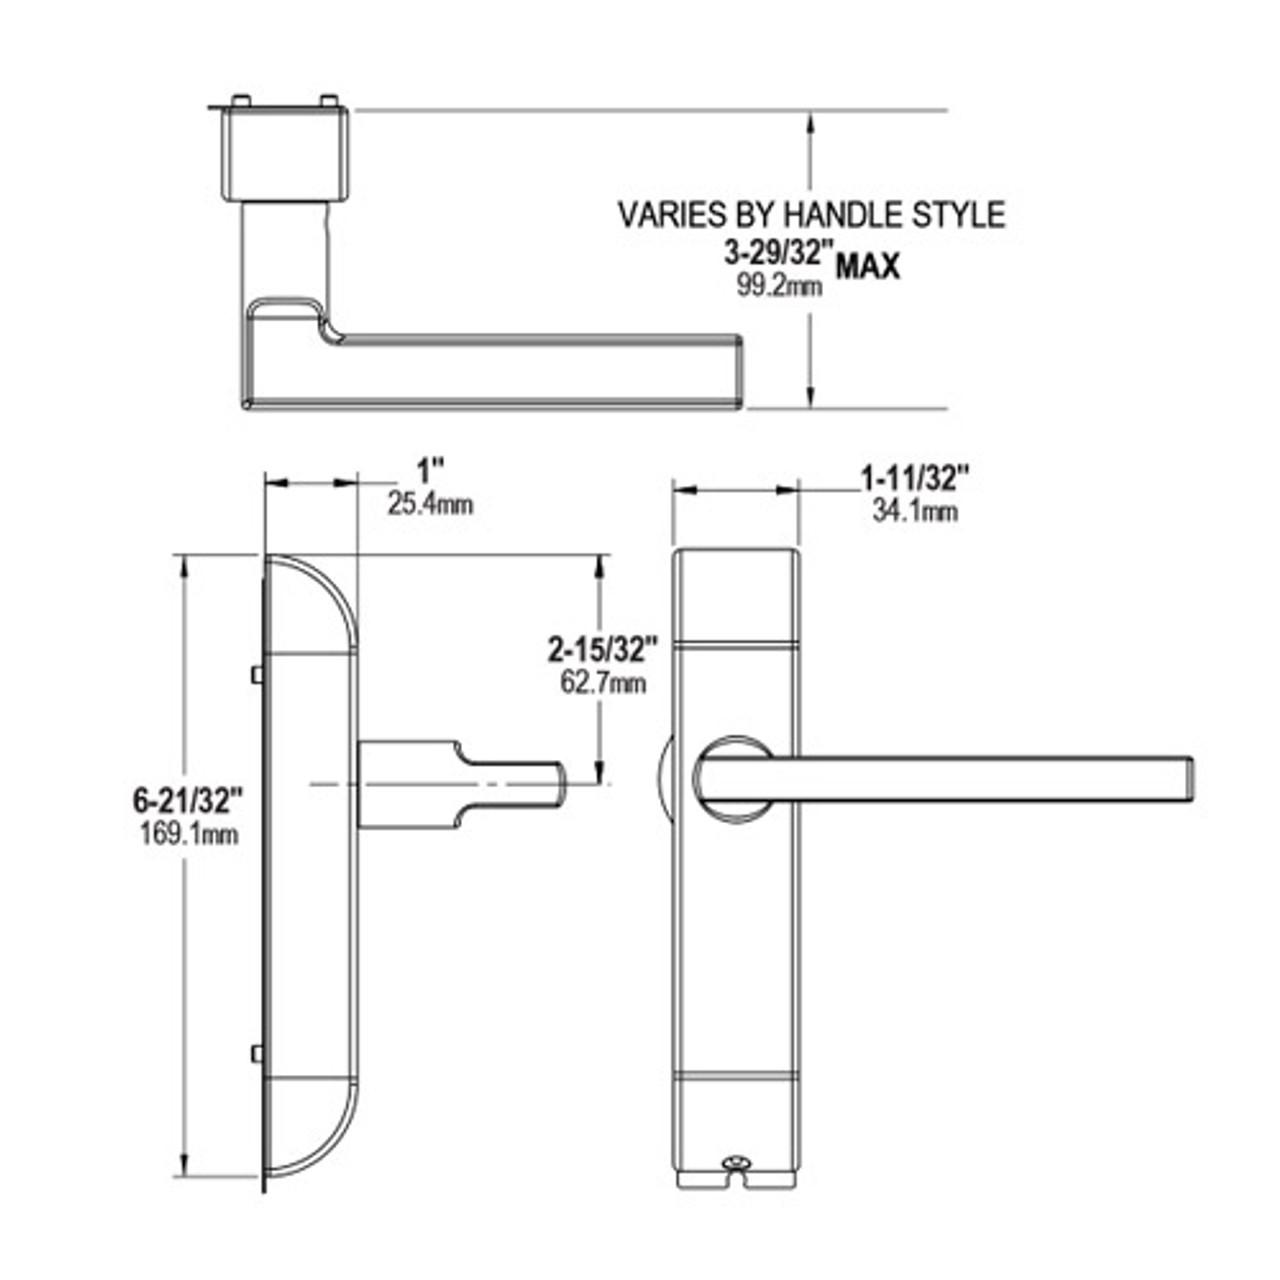 4600-MD-521-US32 Adams Rite MD Designer handle Dimensional View